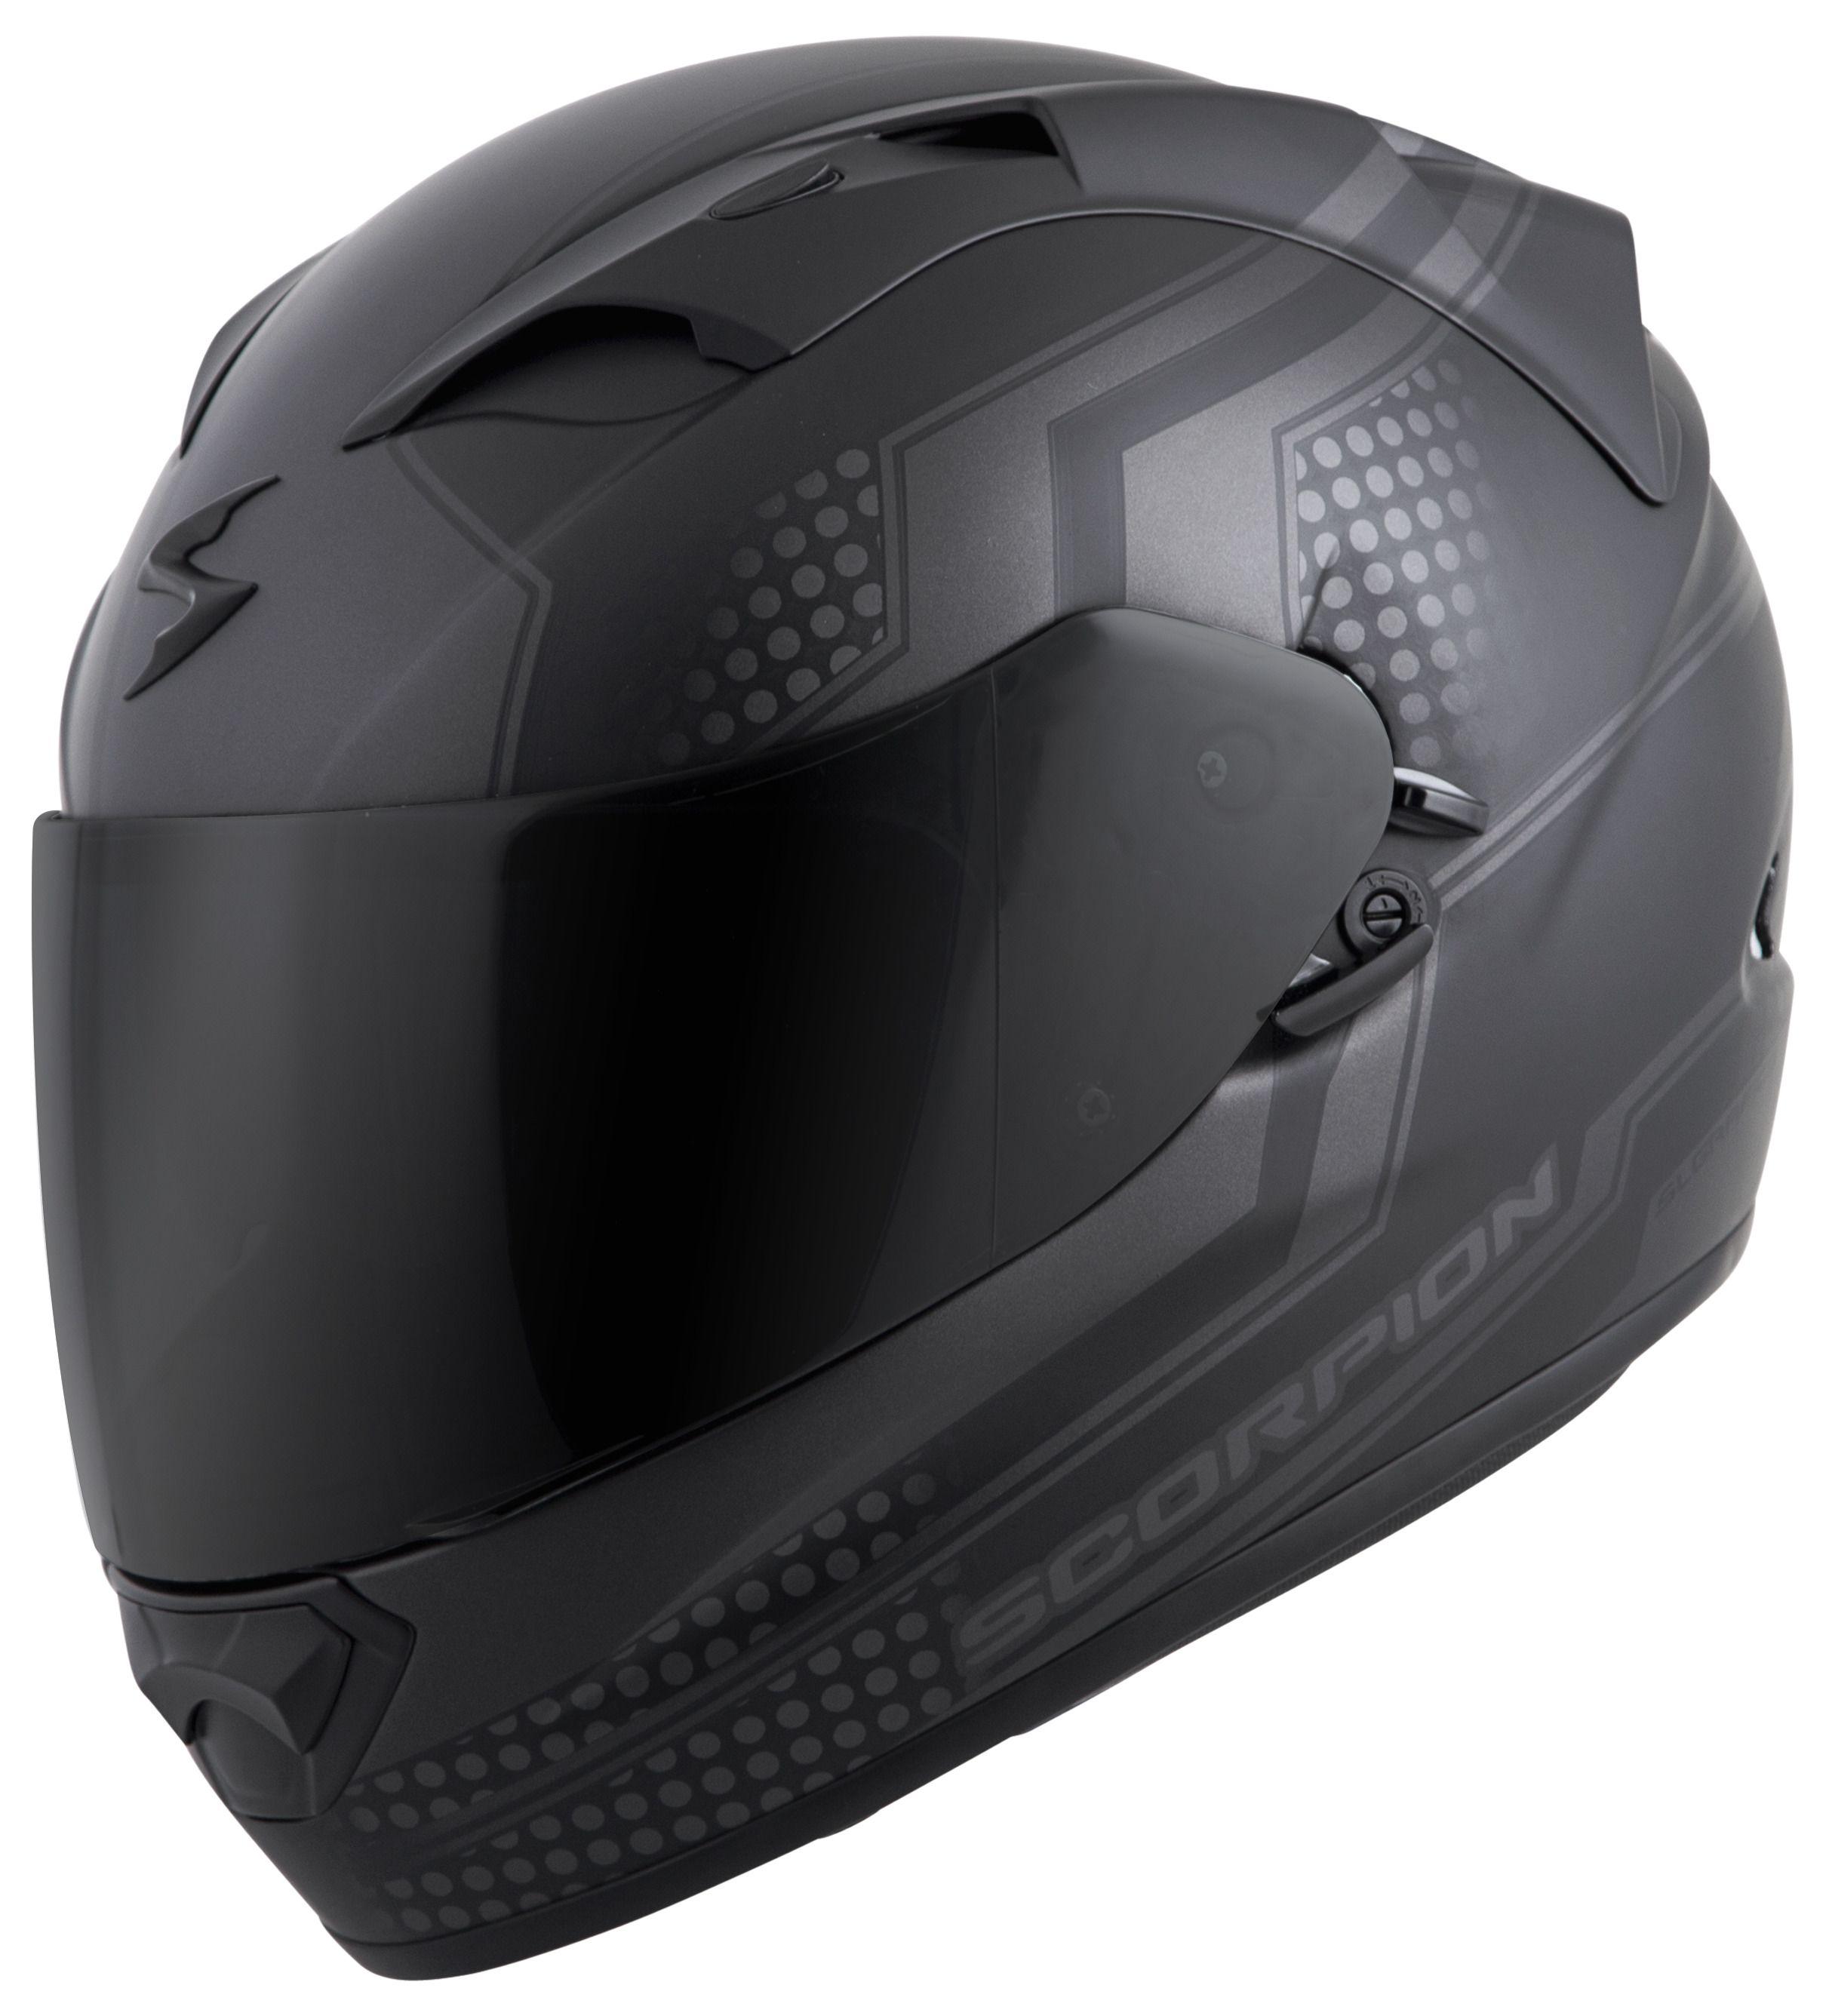 Scorpion Exo T1200 Alias Helmet 20 63 99 Off Revzilla